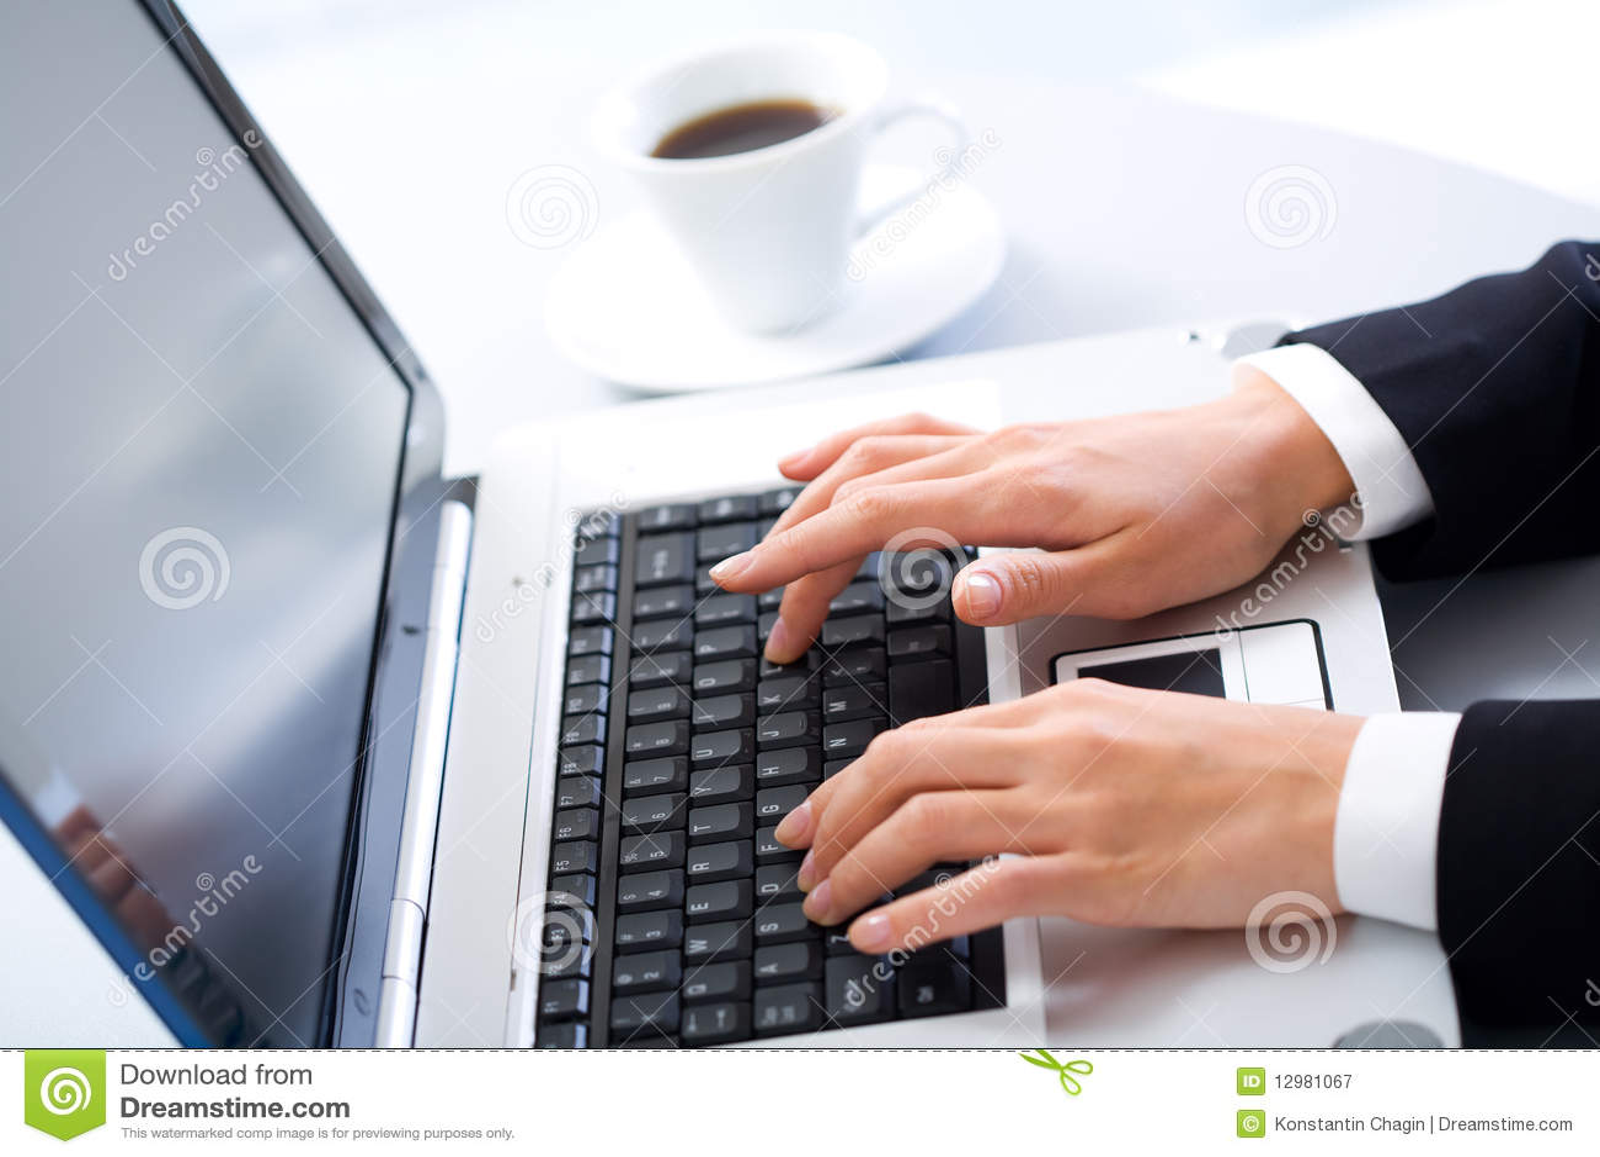 О работе на компьютере